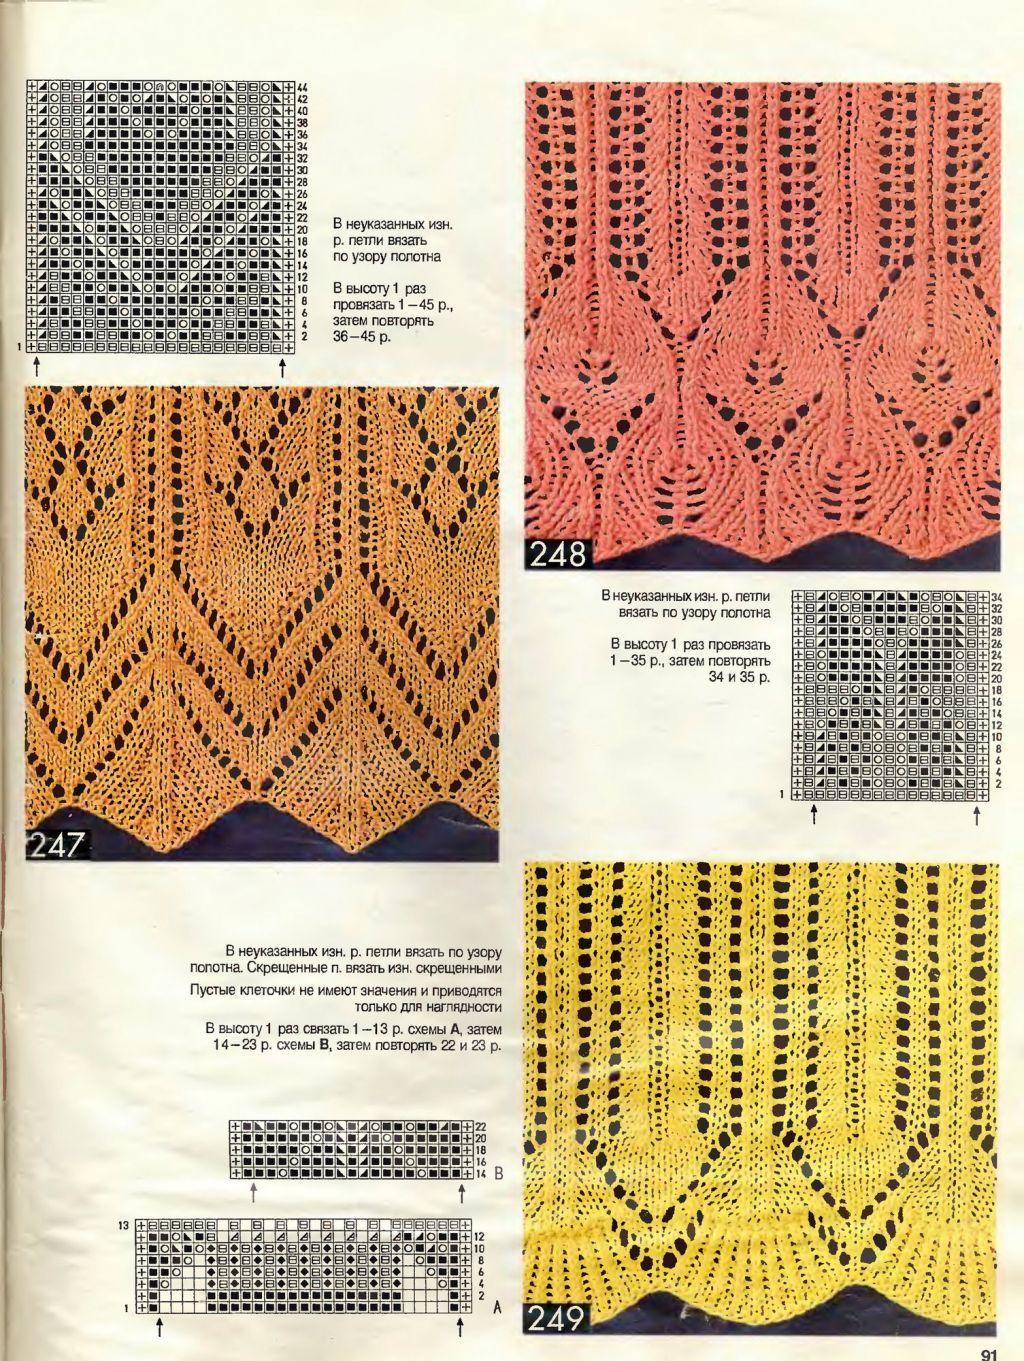 knit lace edging   knit lace edging   Pinterest   Knit lace ...